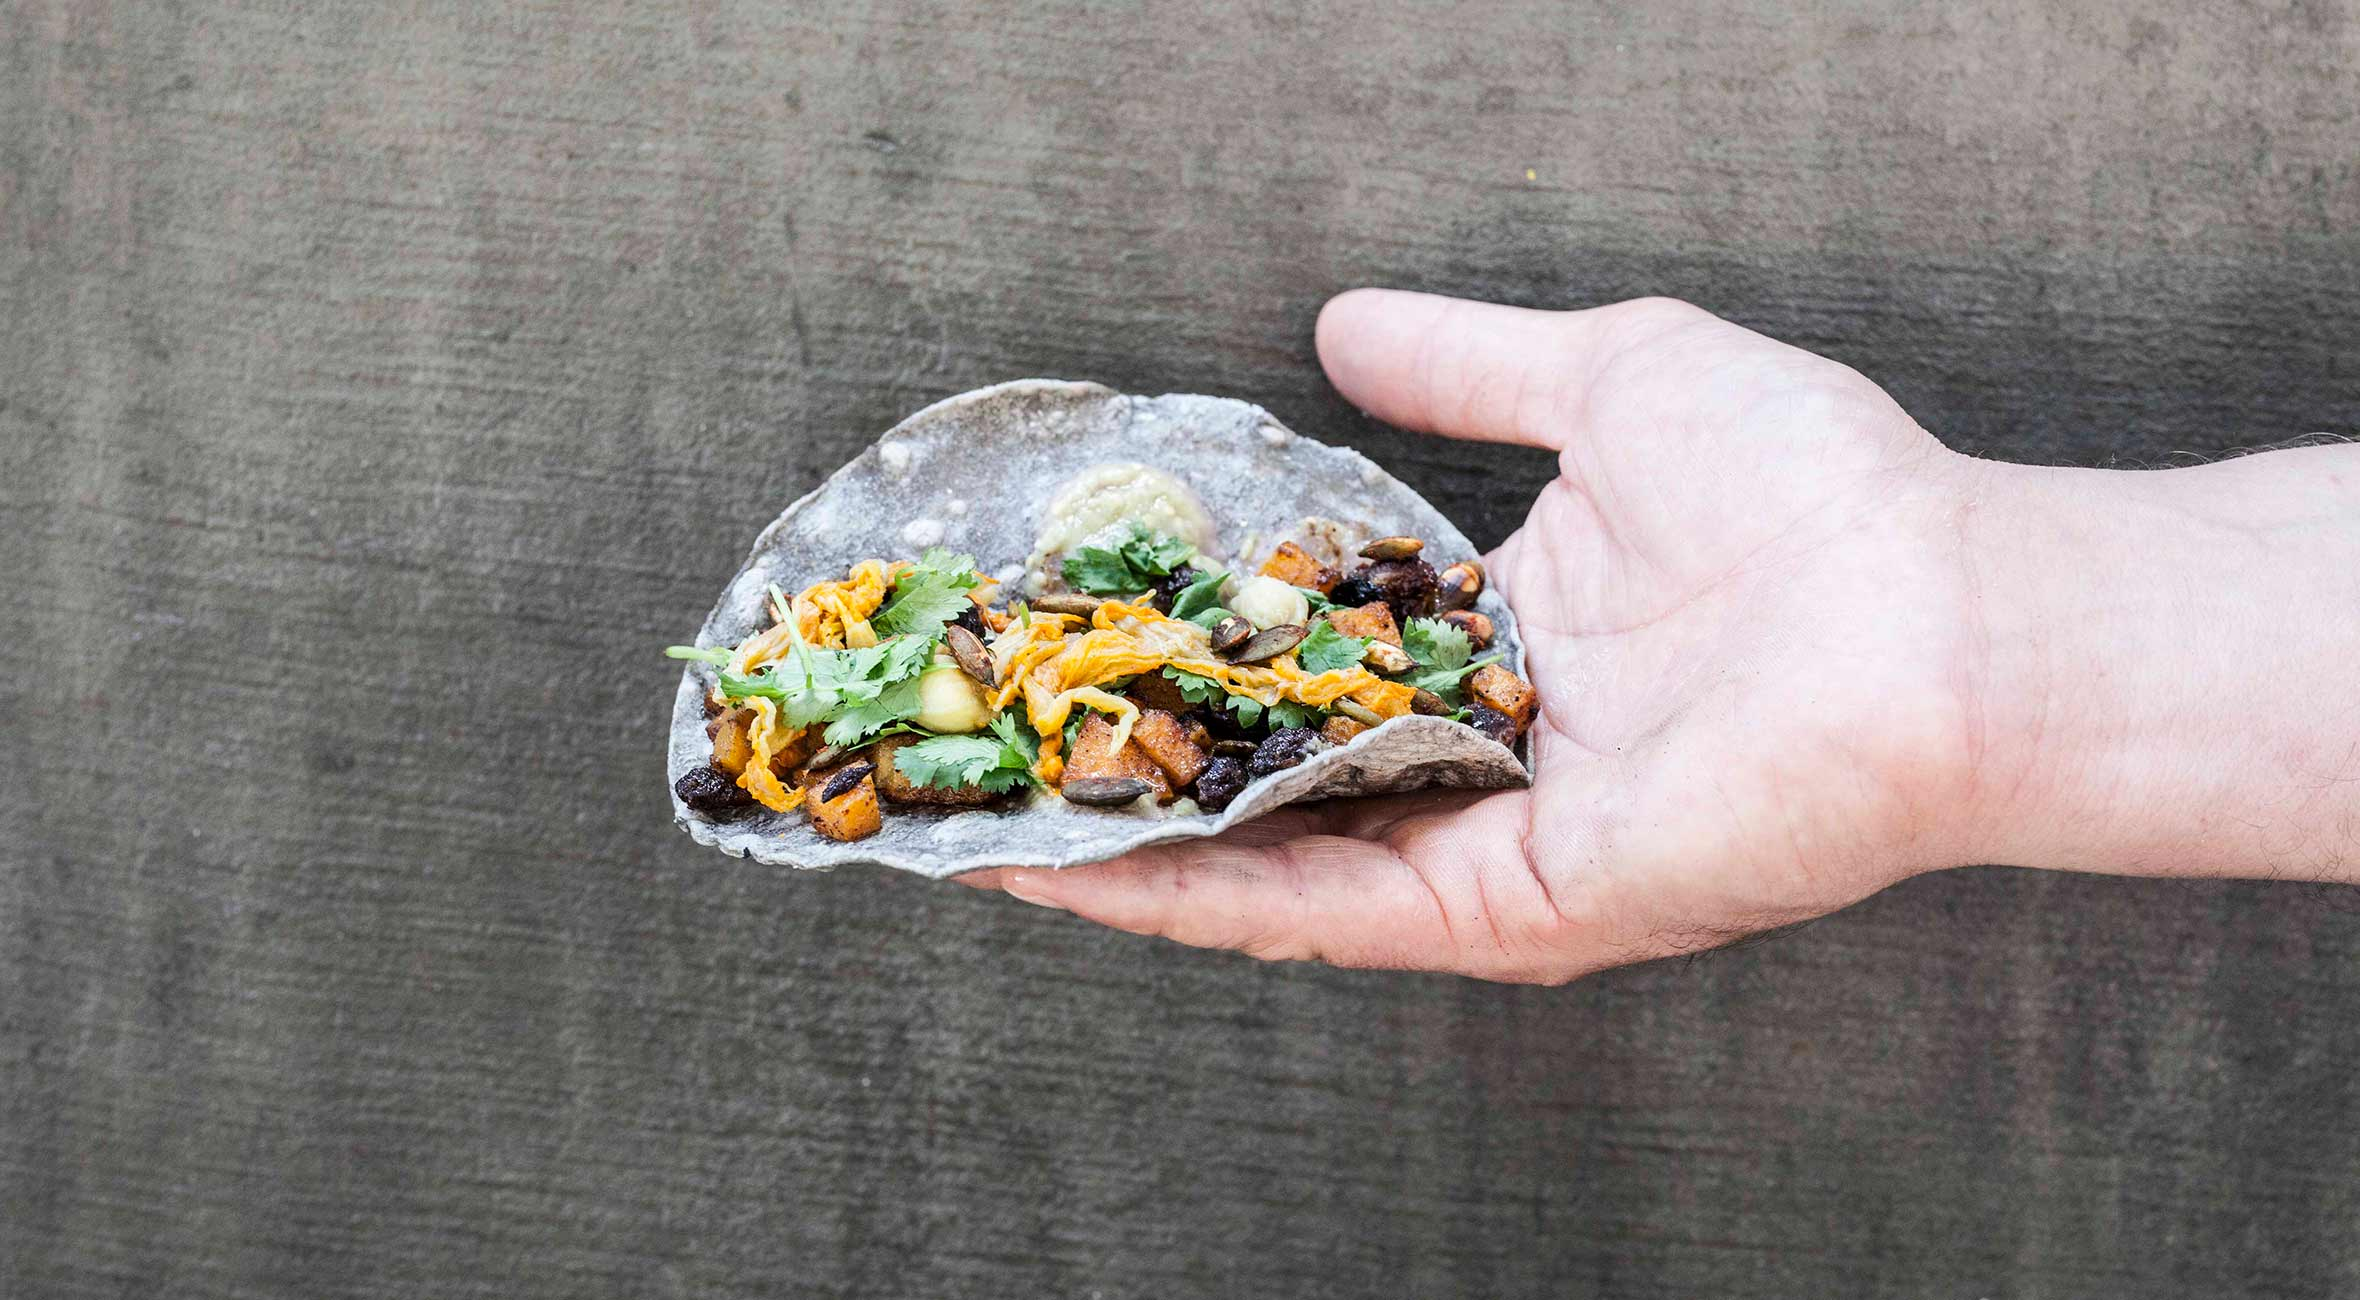 Taco Feast for 2 personer hos BlueTaco i Blågårdsgade – Få byens vildeste tacos med mexicansk trøffel, avocado, stegt kaktus, braiseret okse m.m.